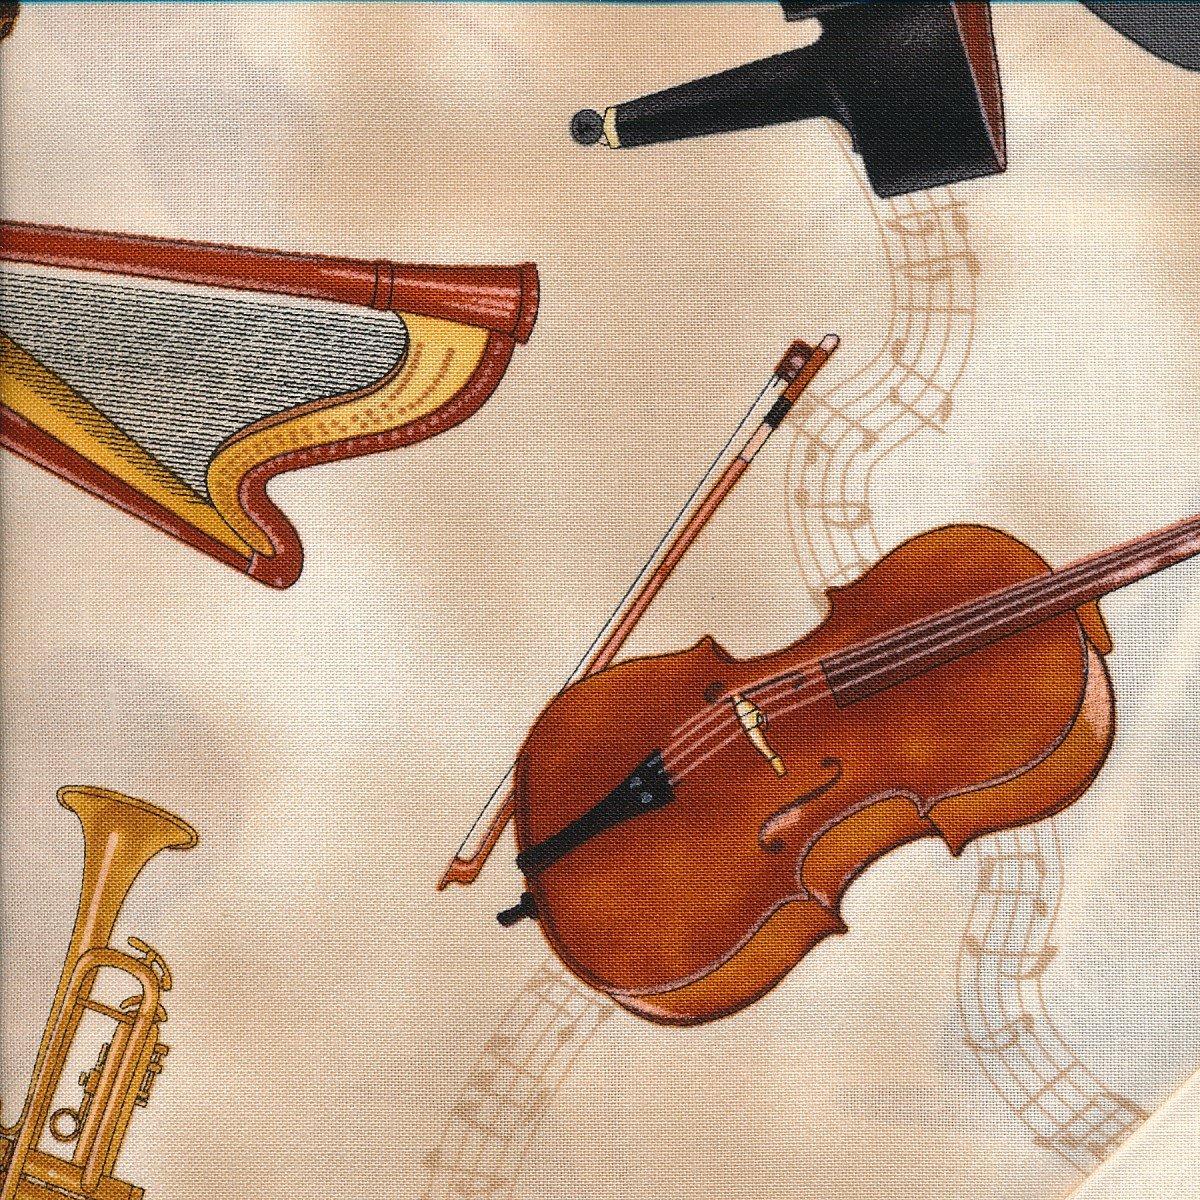 Instruments on Cream